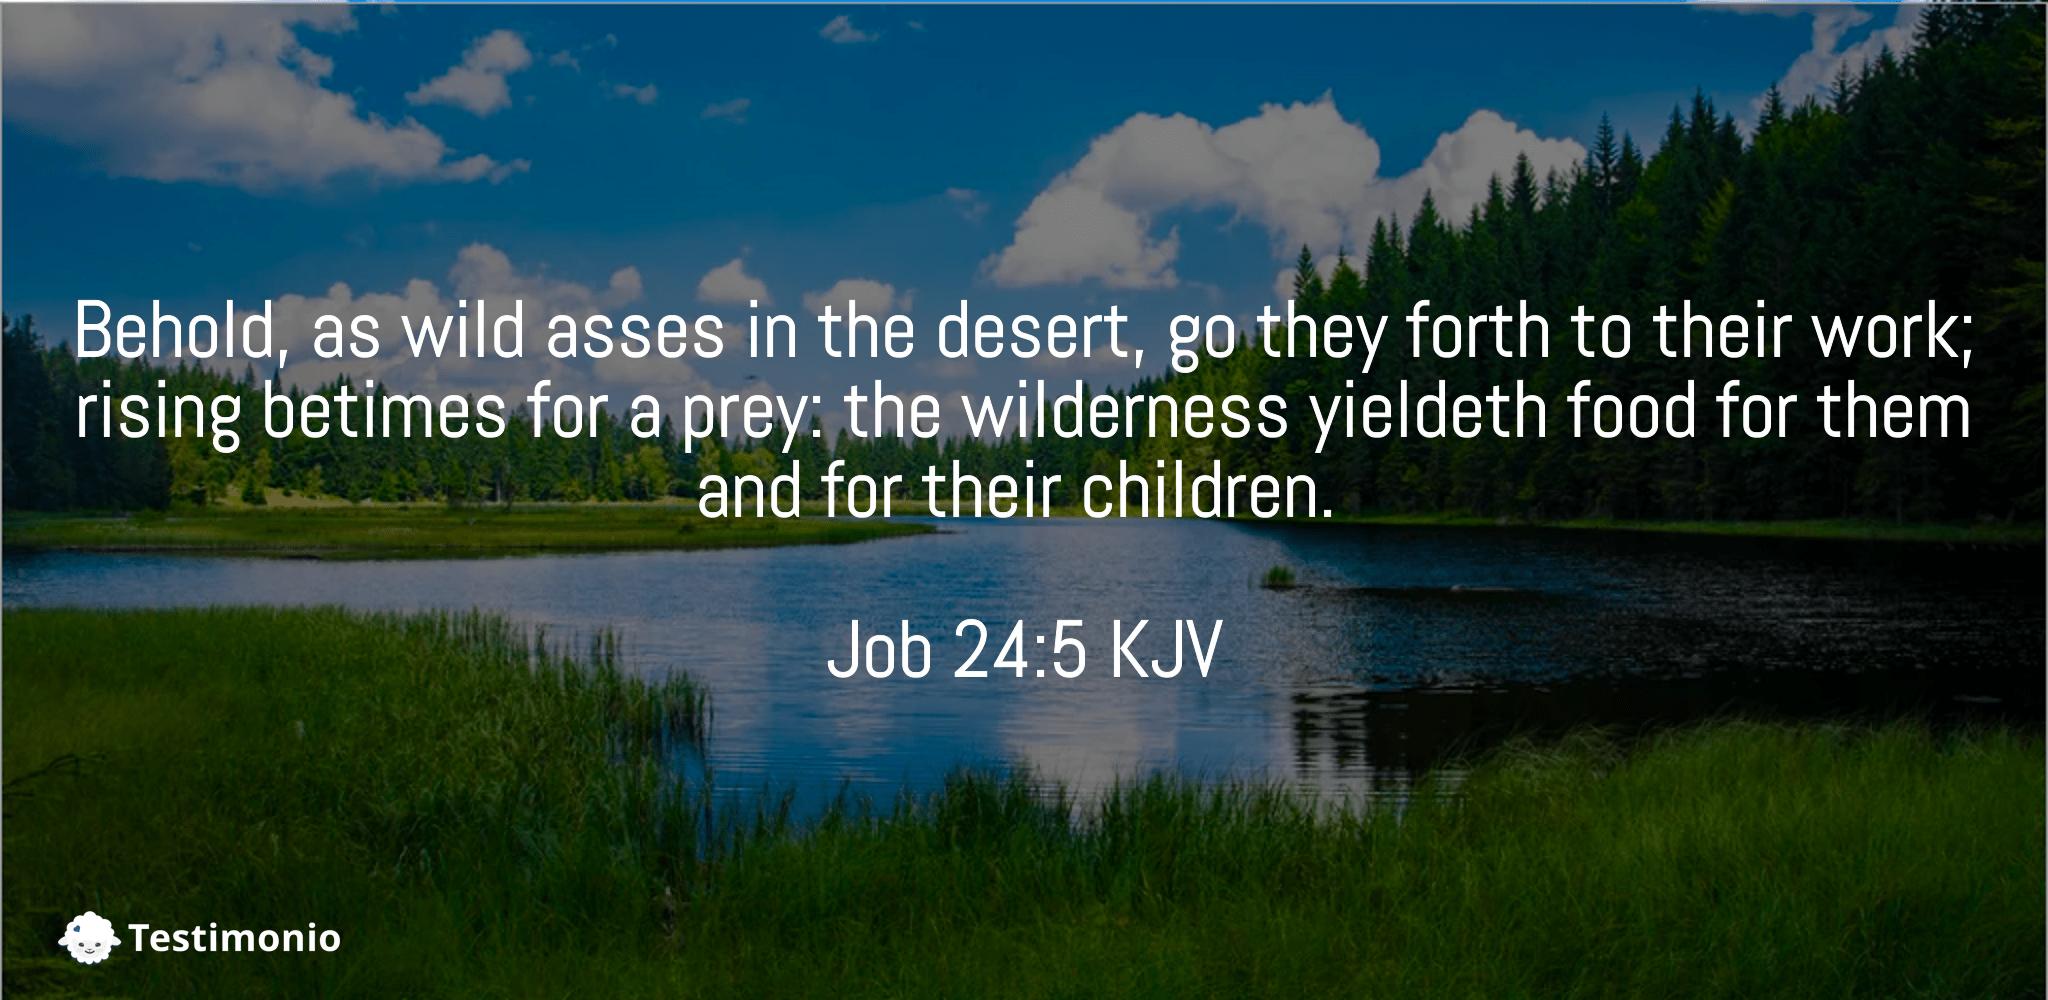 Job 24:5